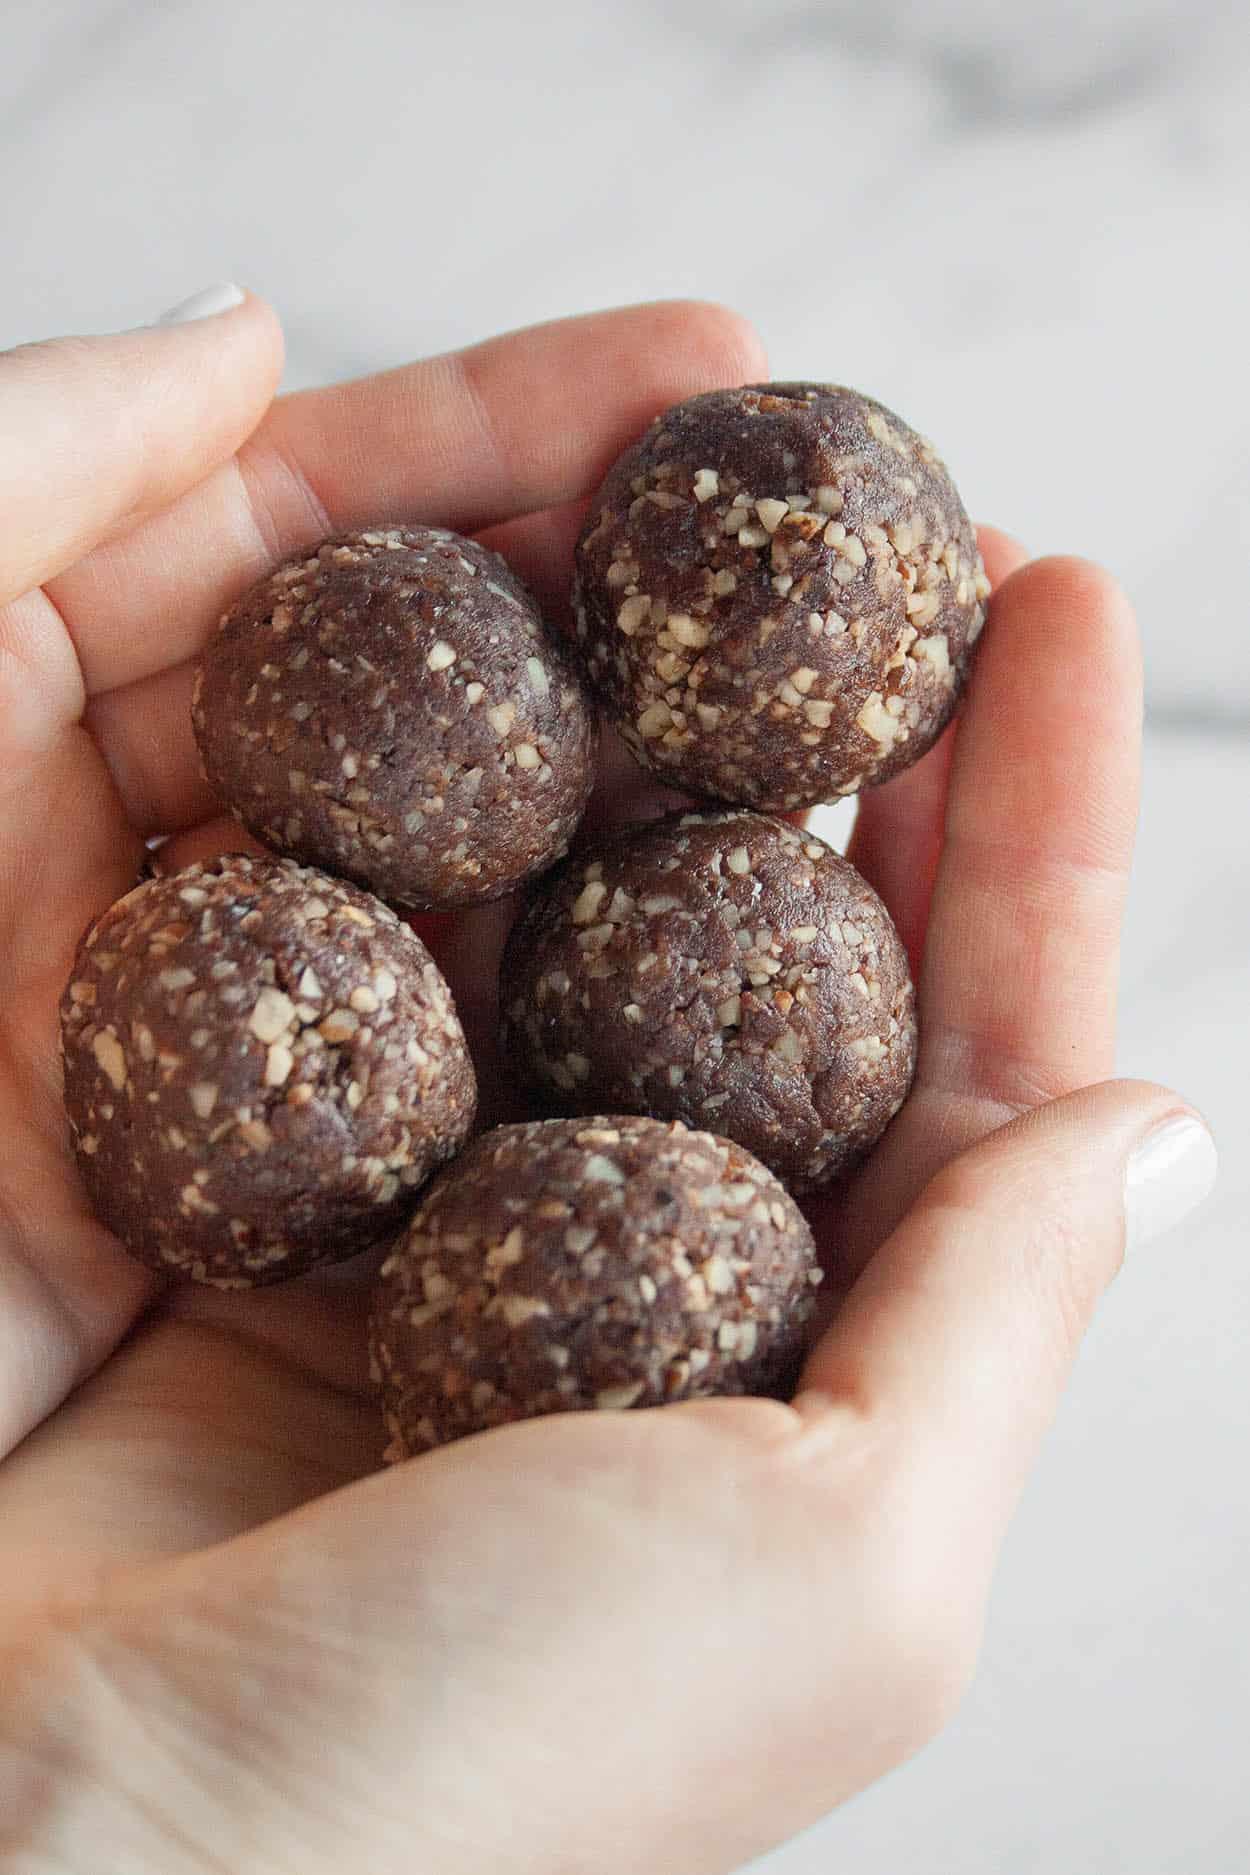 3 Ingredient Brownie Bites | paleo, gluten free, dairy free, vegan, raw, dessert recipe, energy bites, snacks, cacao powder, hazelnuts, dates | hungrybynature.com